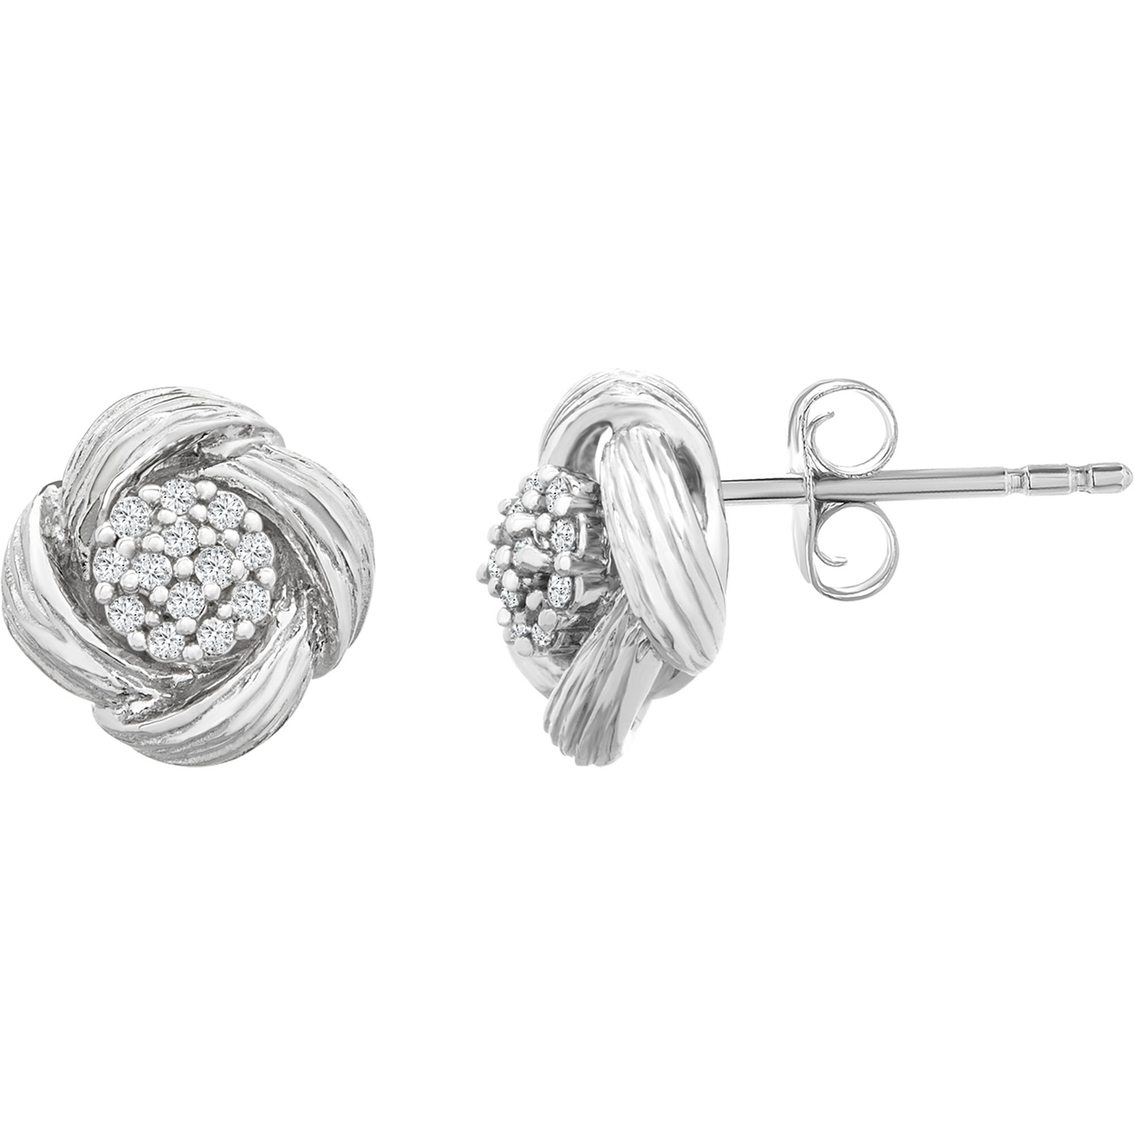 Sterling Silver 1 10 Ctw Diamond Textured Earrings